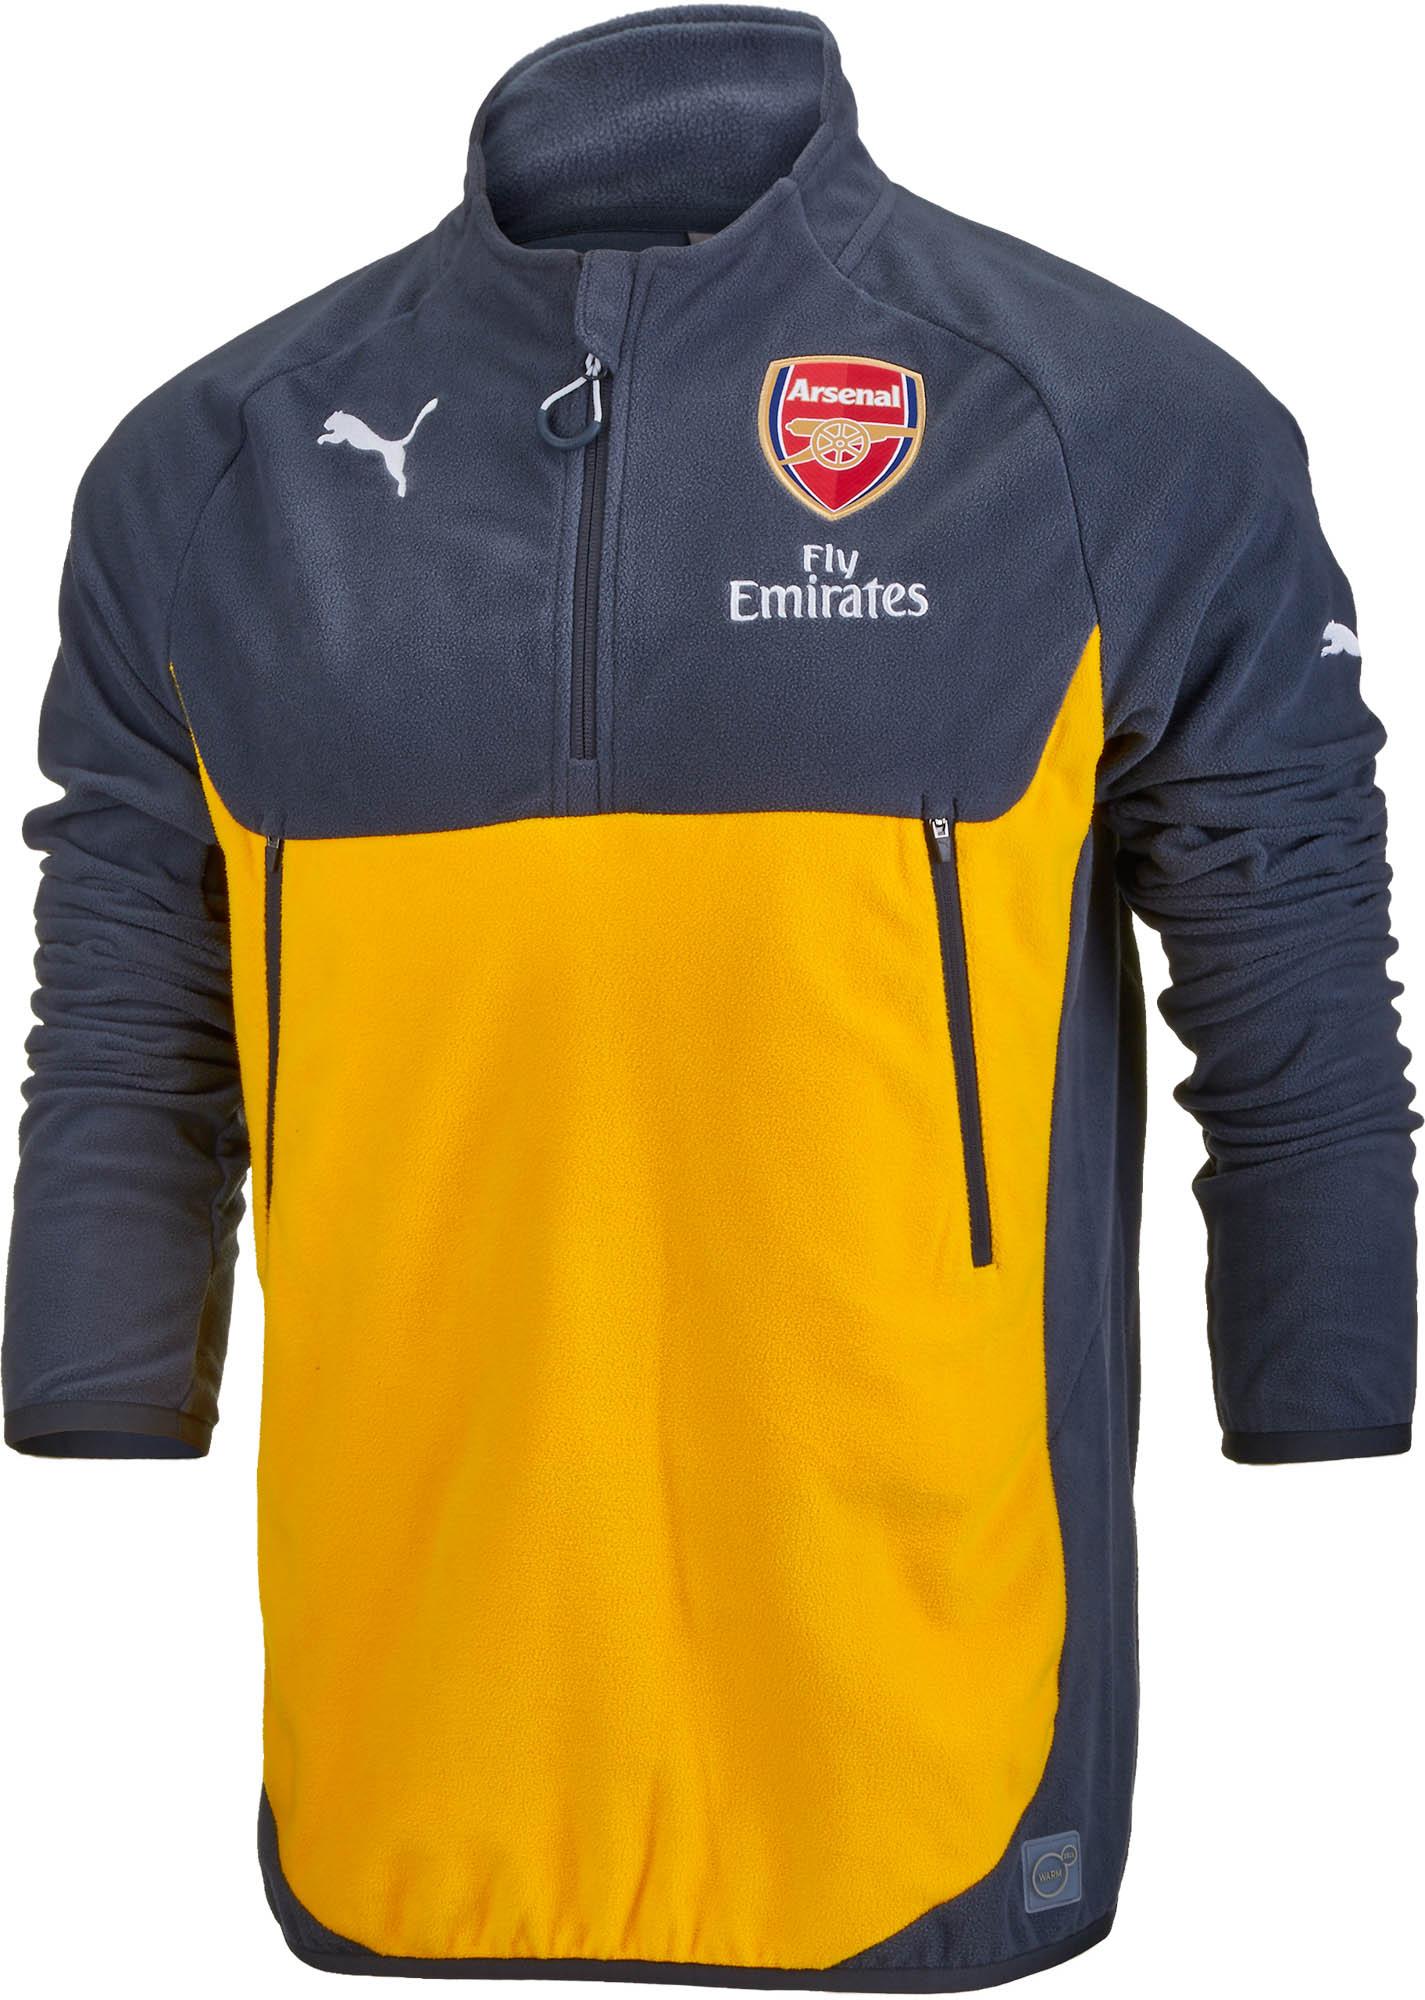 b931b605b5f Puma Arsenal Training Fleece - Ebony   Spectra Yellow